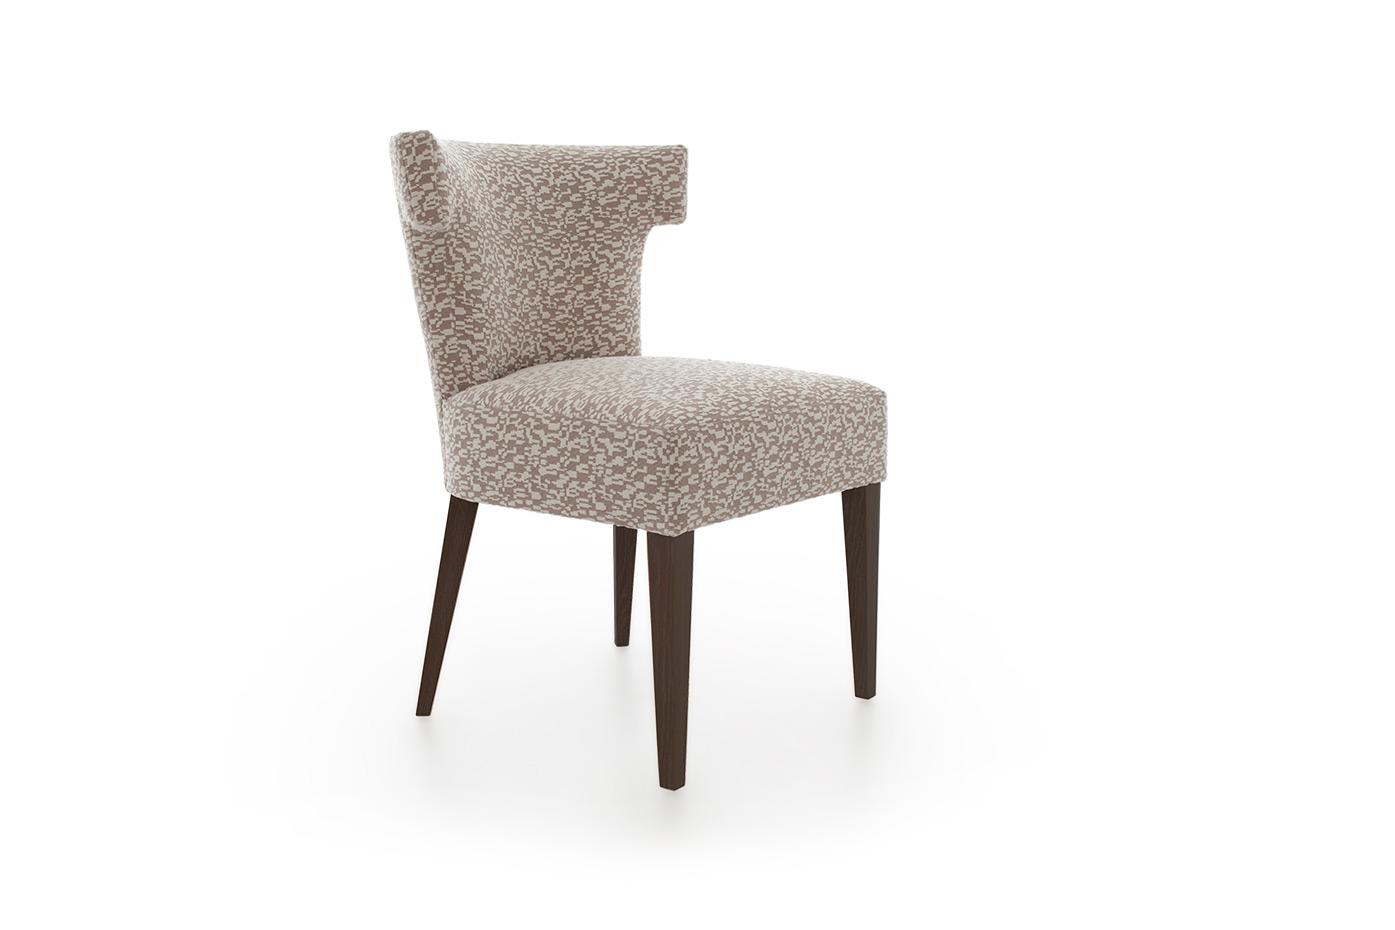 Charlotte James Furniture